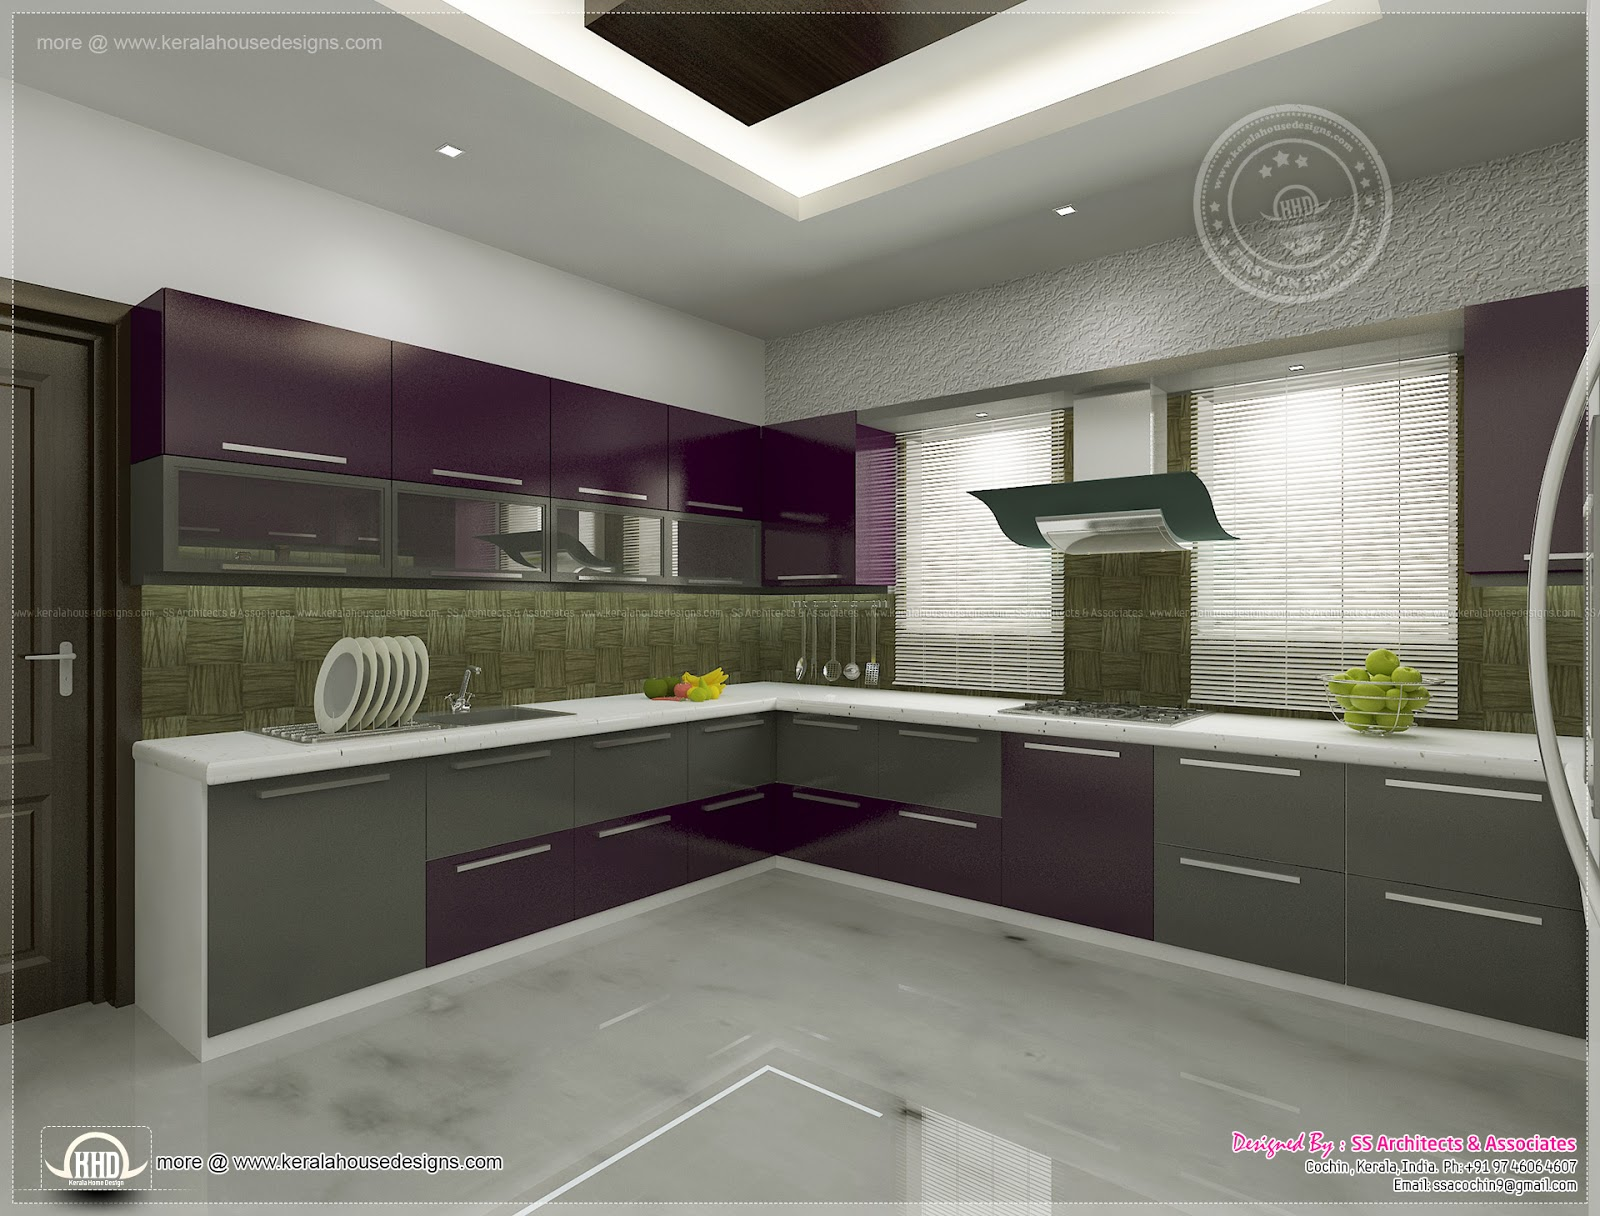 Kitchen Interior Views By SS Architects, Cochin